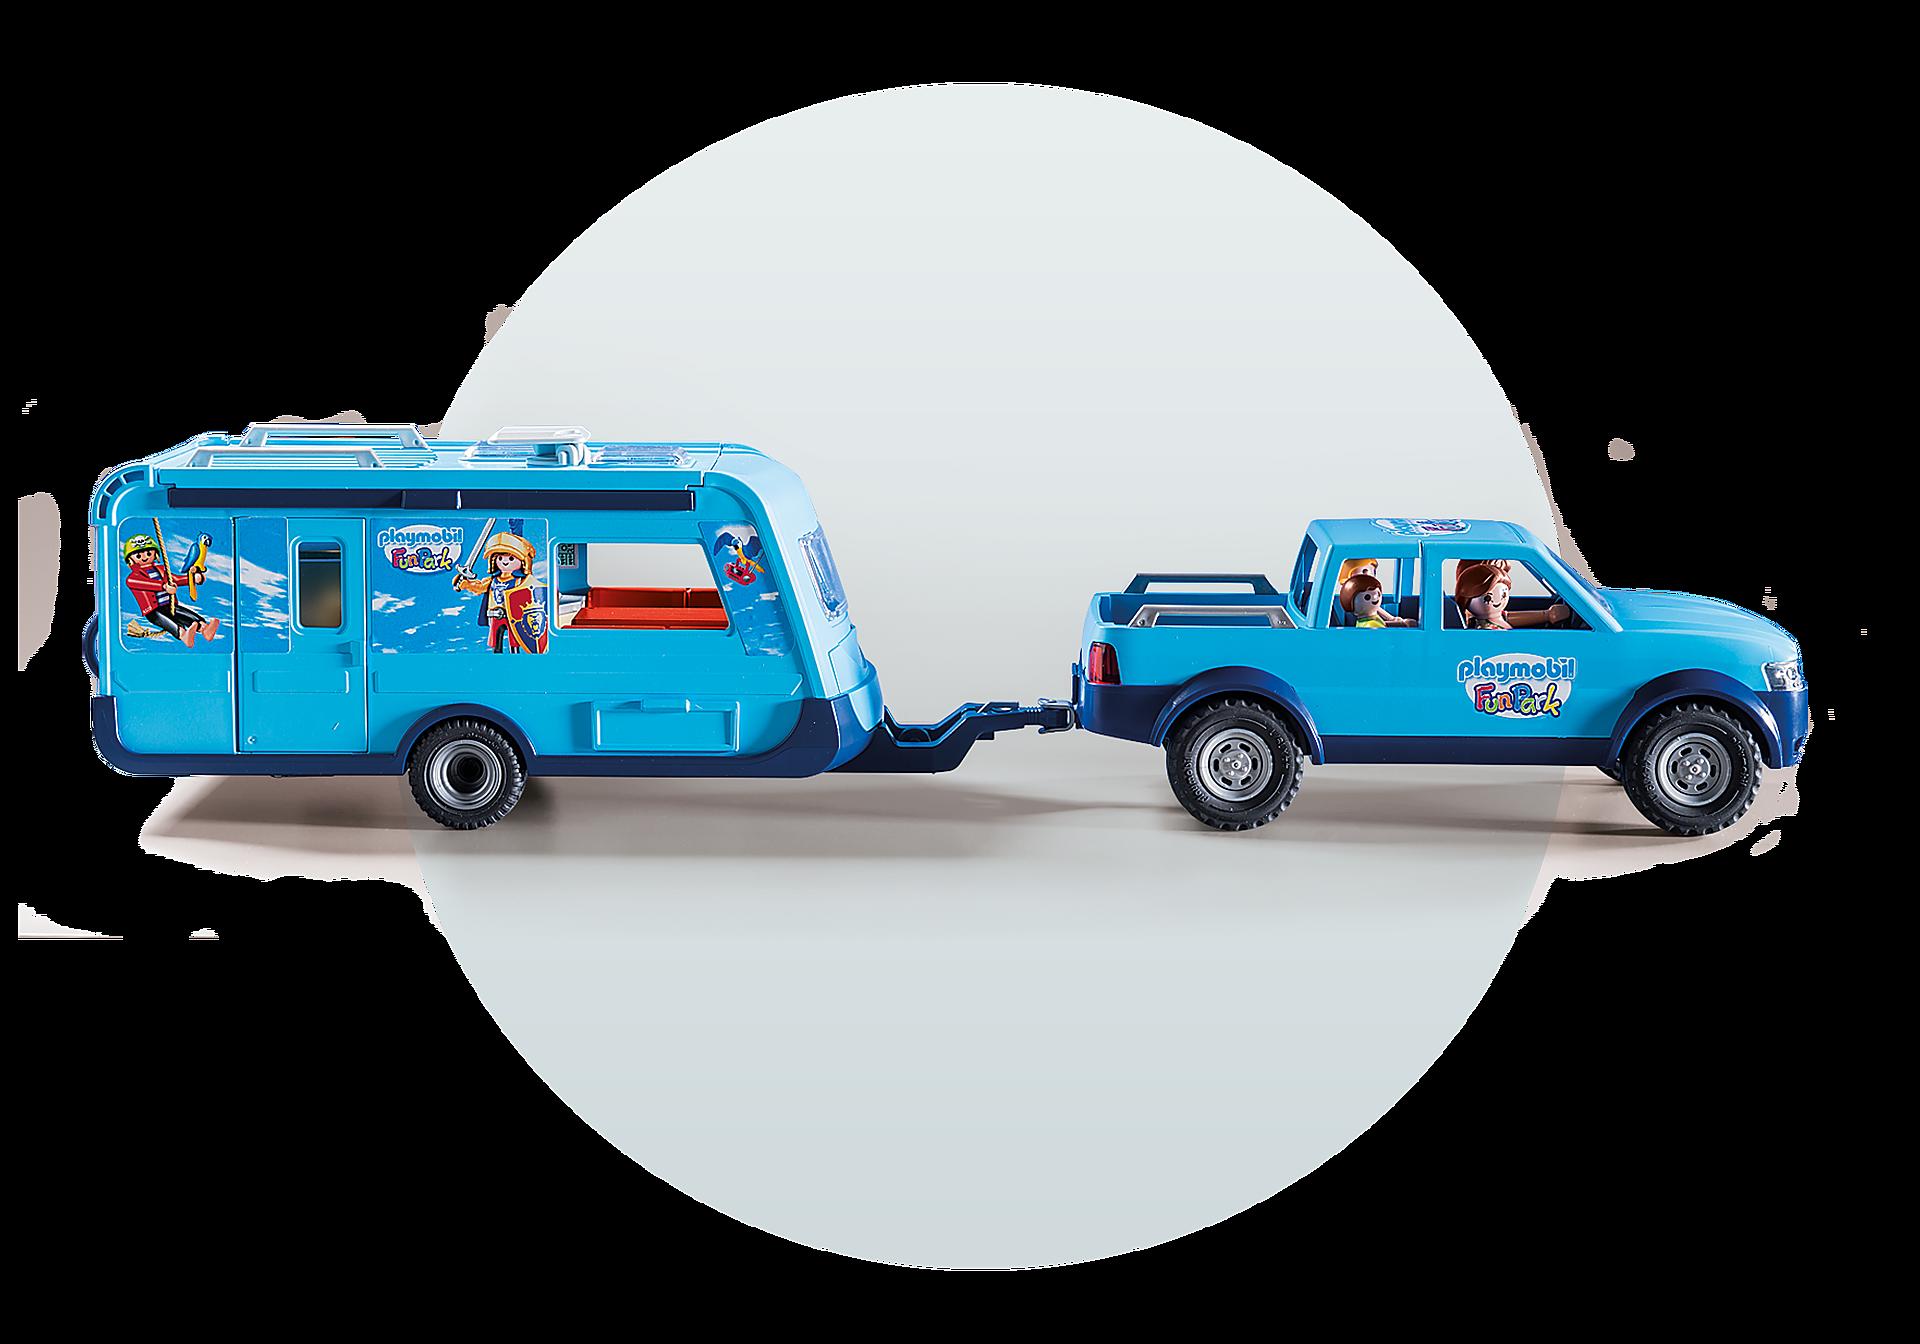 http://media.playmobil.com/i/playmobil/9502_product_extra4/Famille avec voiture et caravane